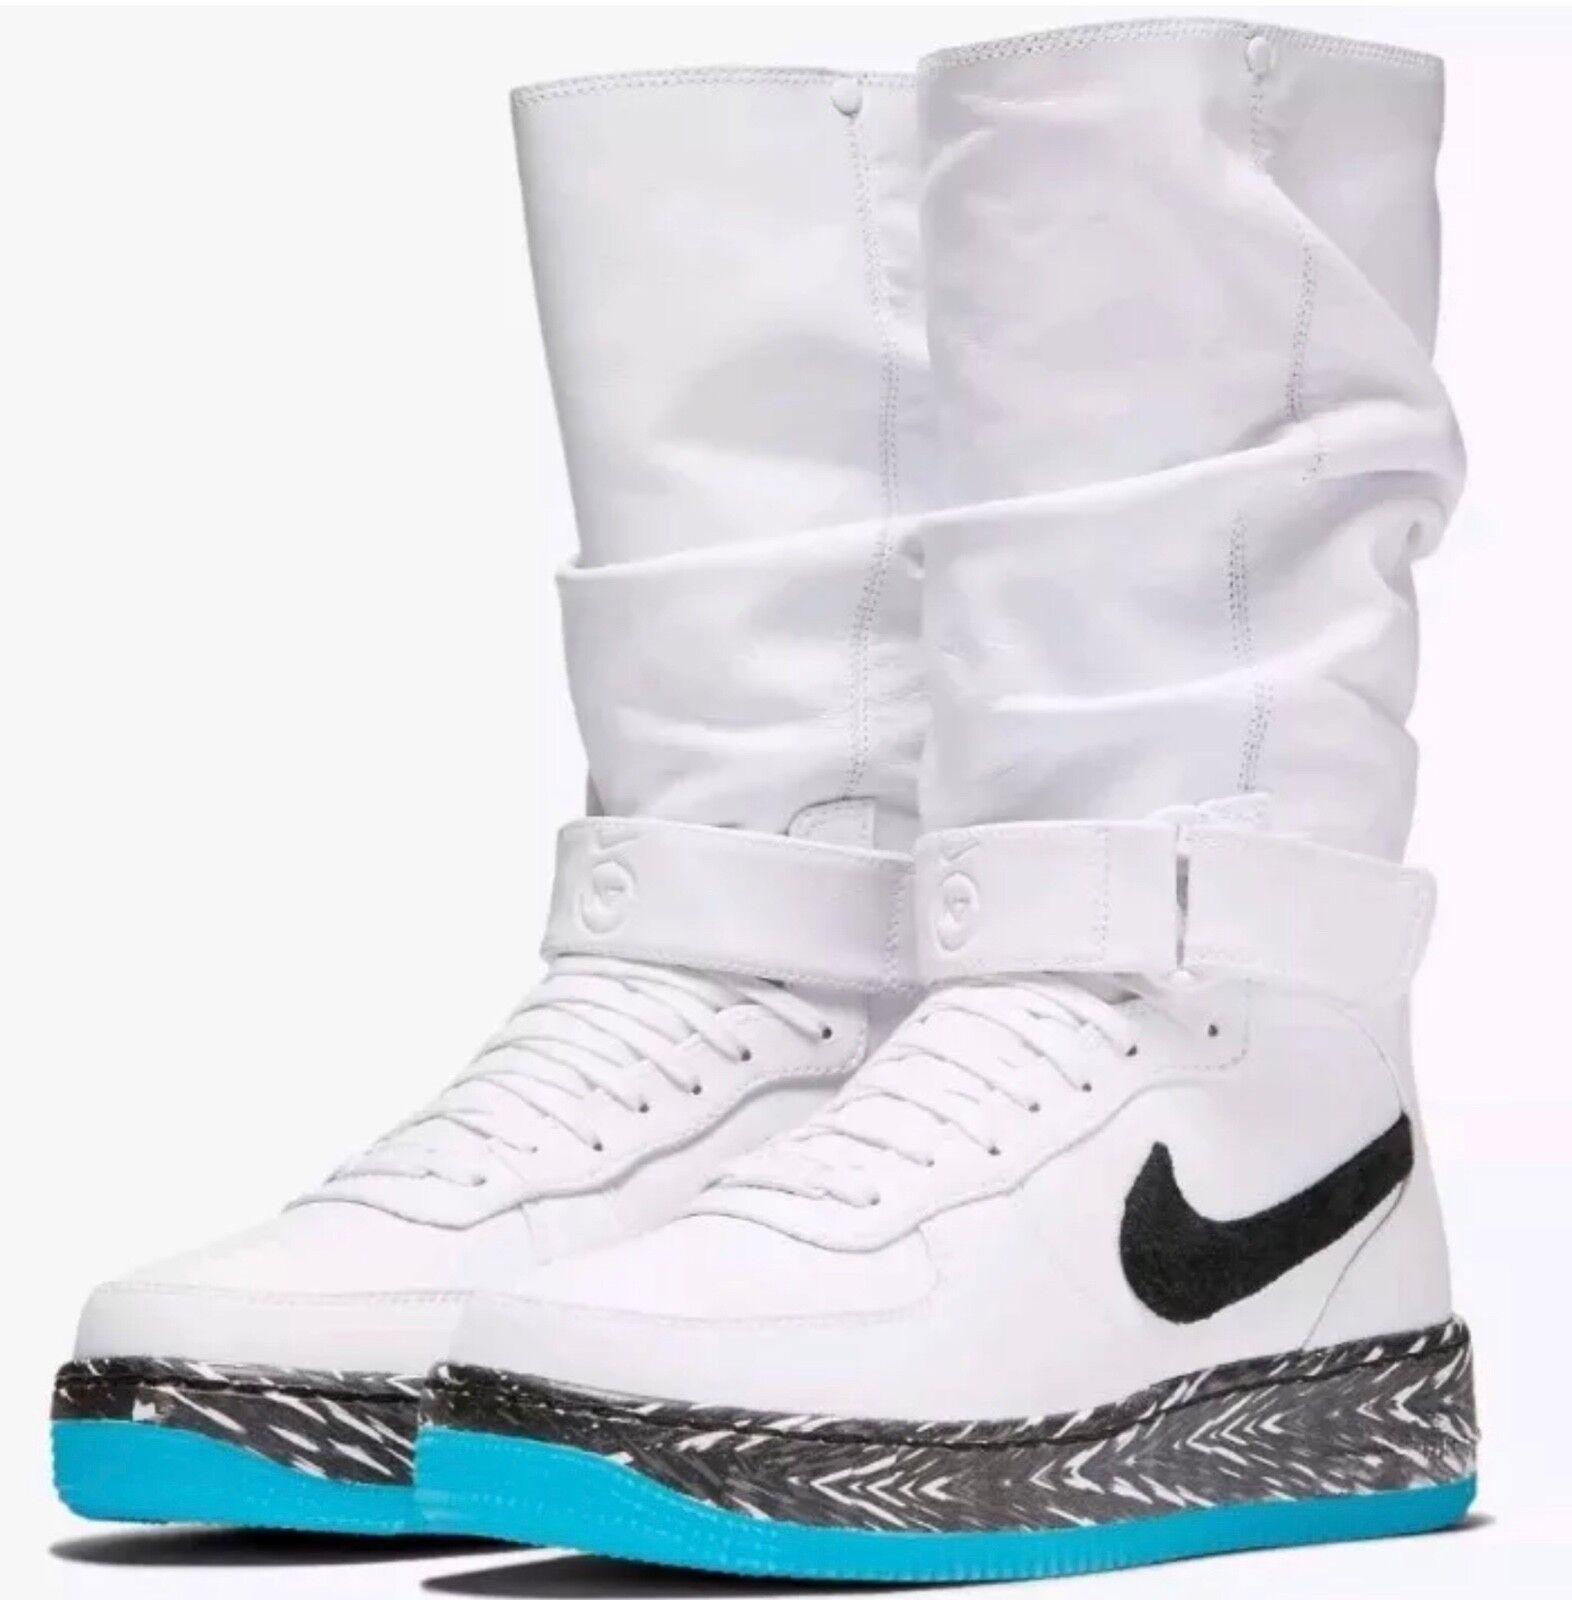 New  Nike  AF1 Upstep Warrior N7 donna 65533;s Dimensione 7 bianca  nero  Turquoise 873308 -103  fino al 70% di sconto